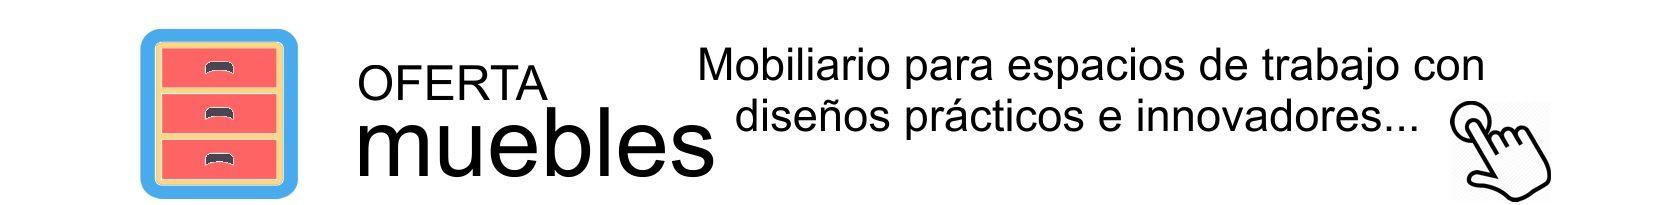 fondoblanco-banner-muebles